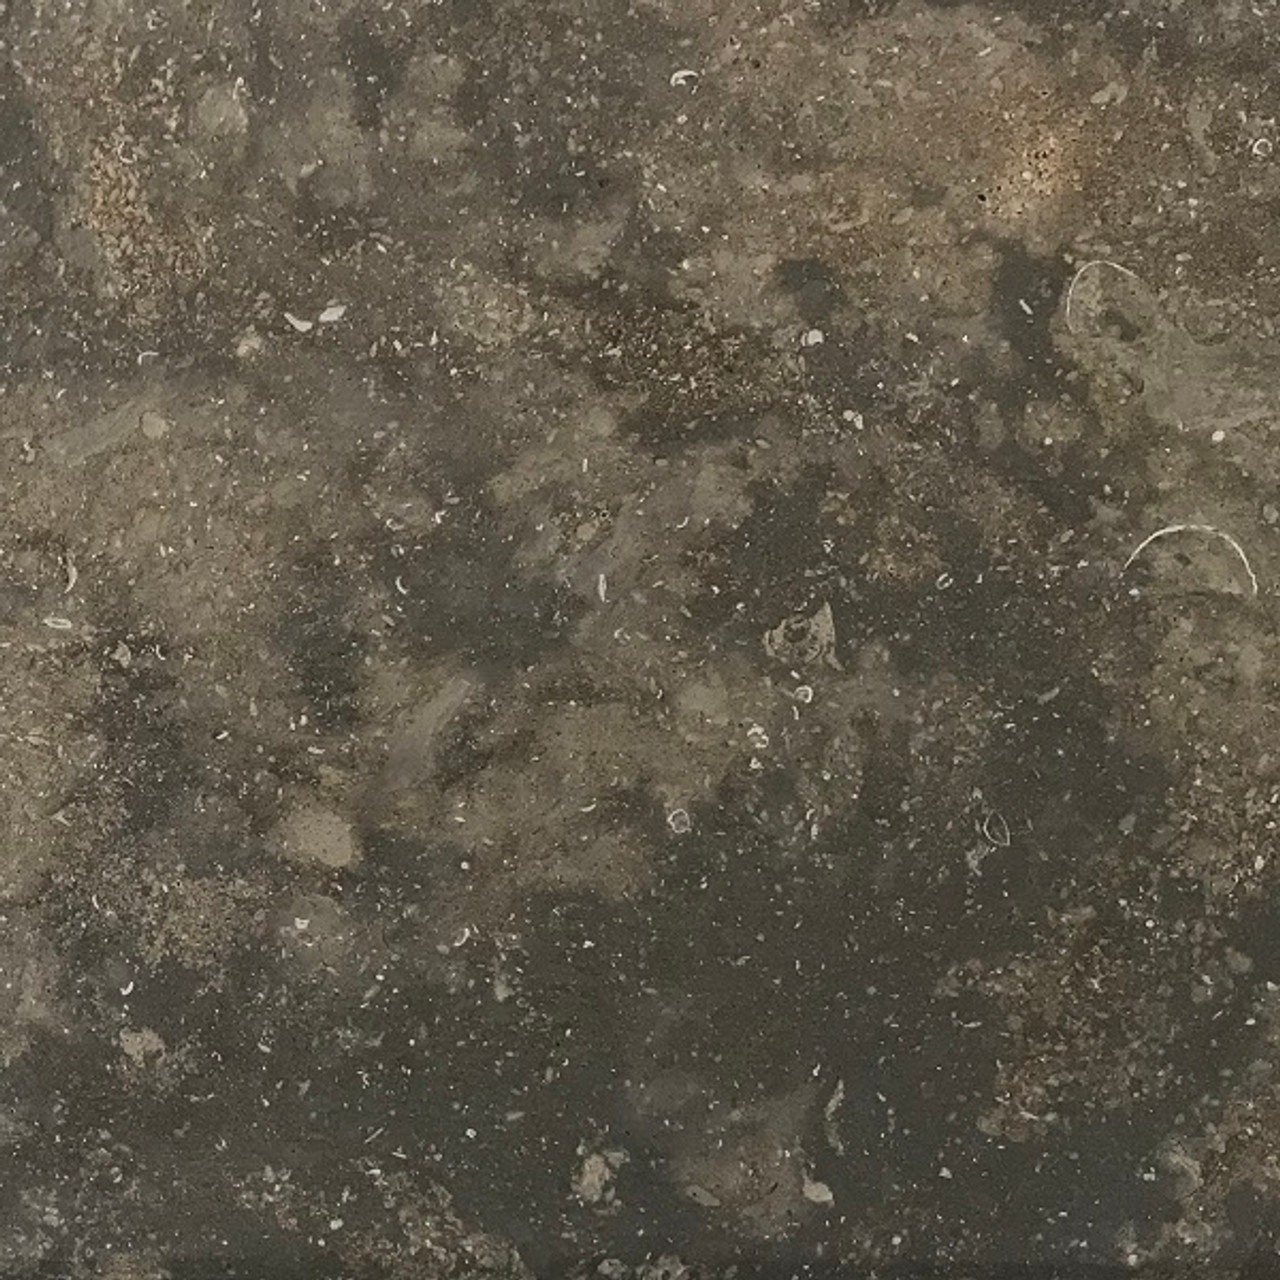 Plaza gray limestone 240 grit honed finish